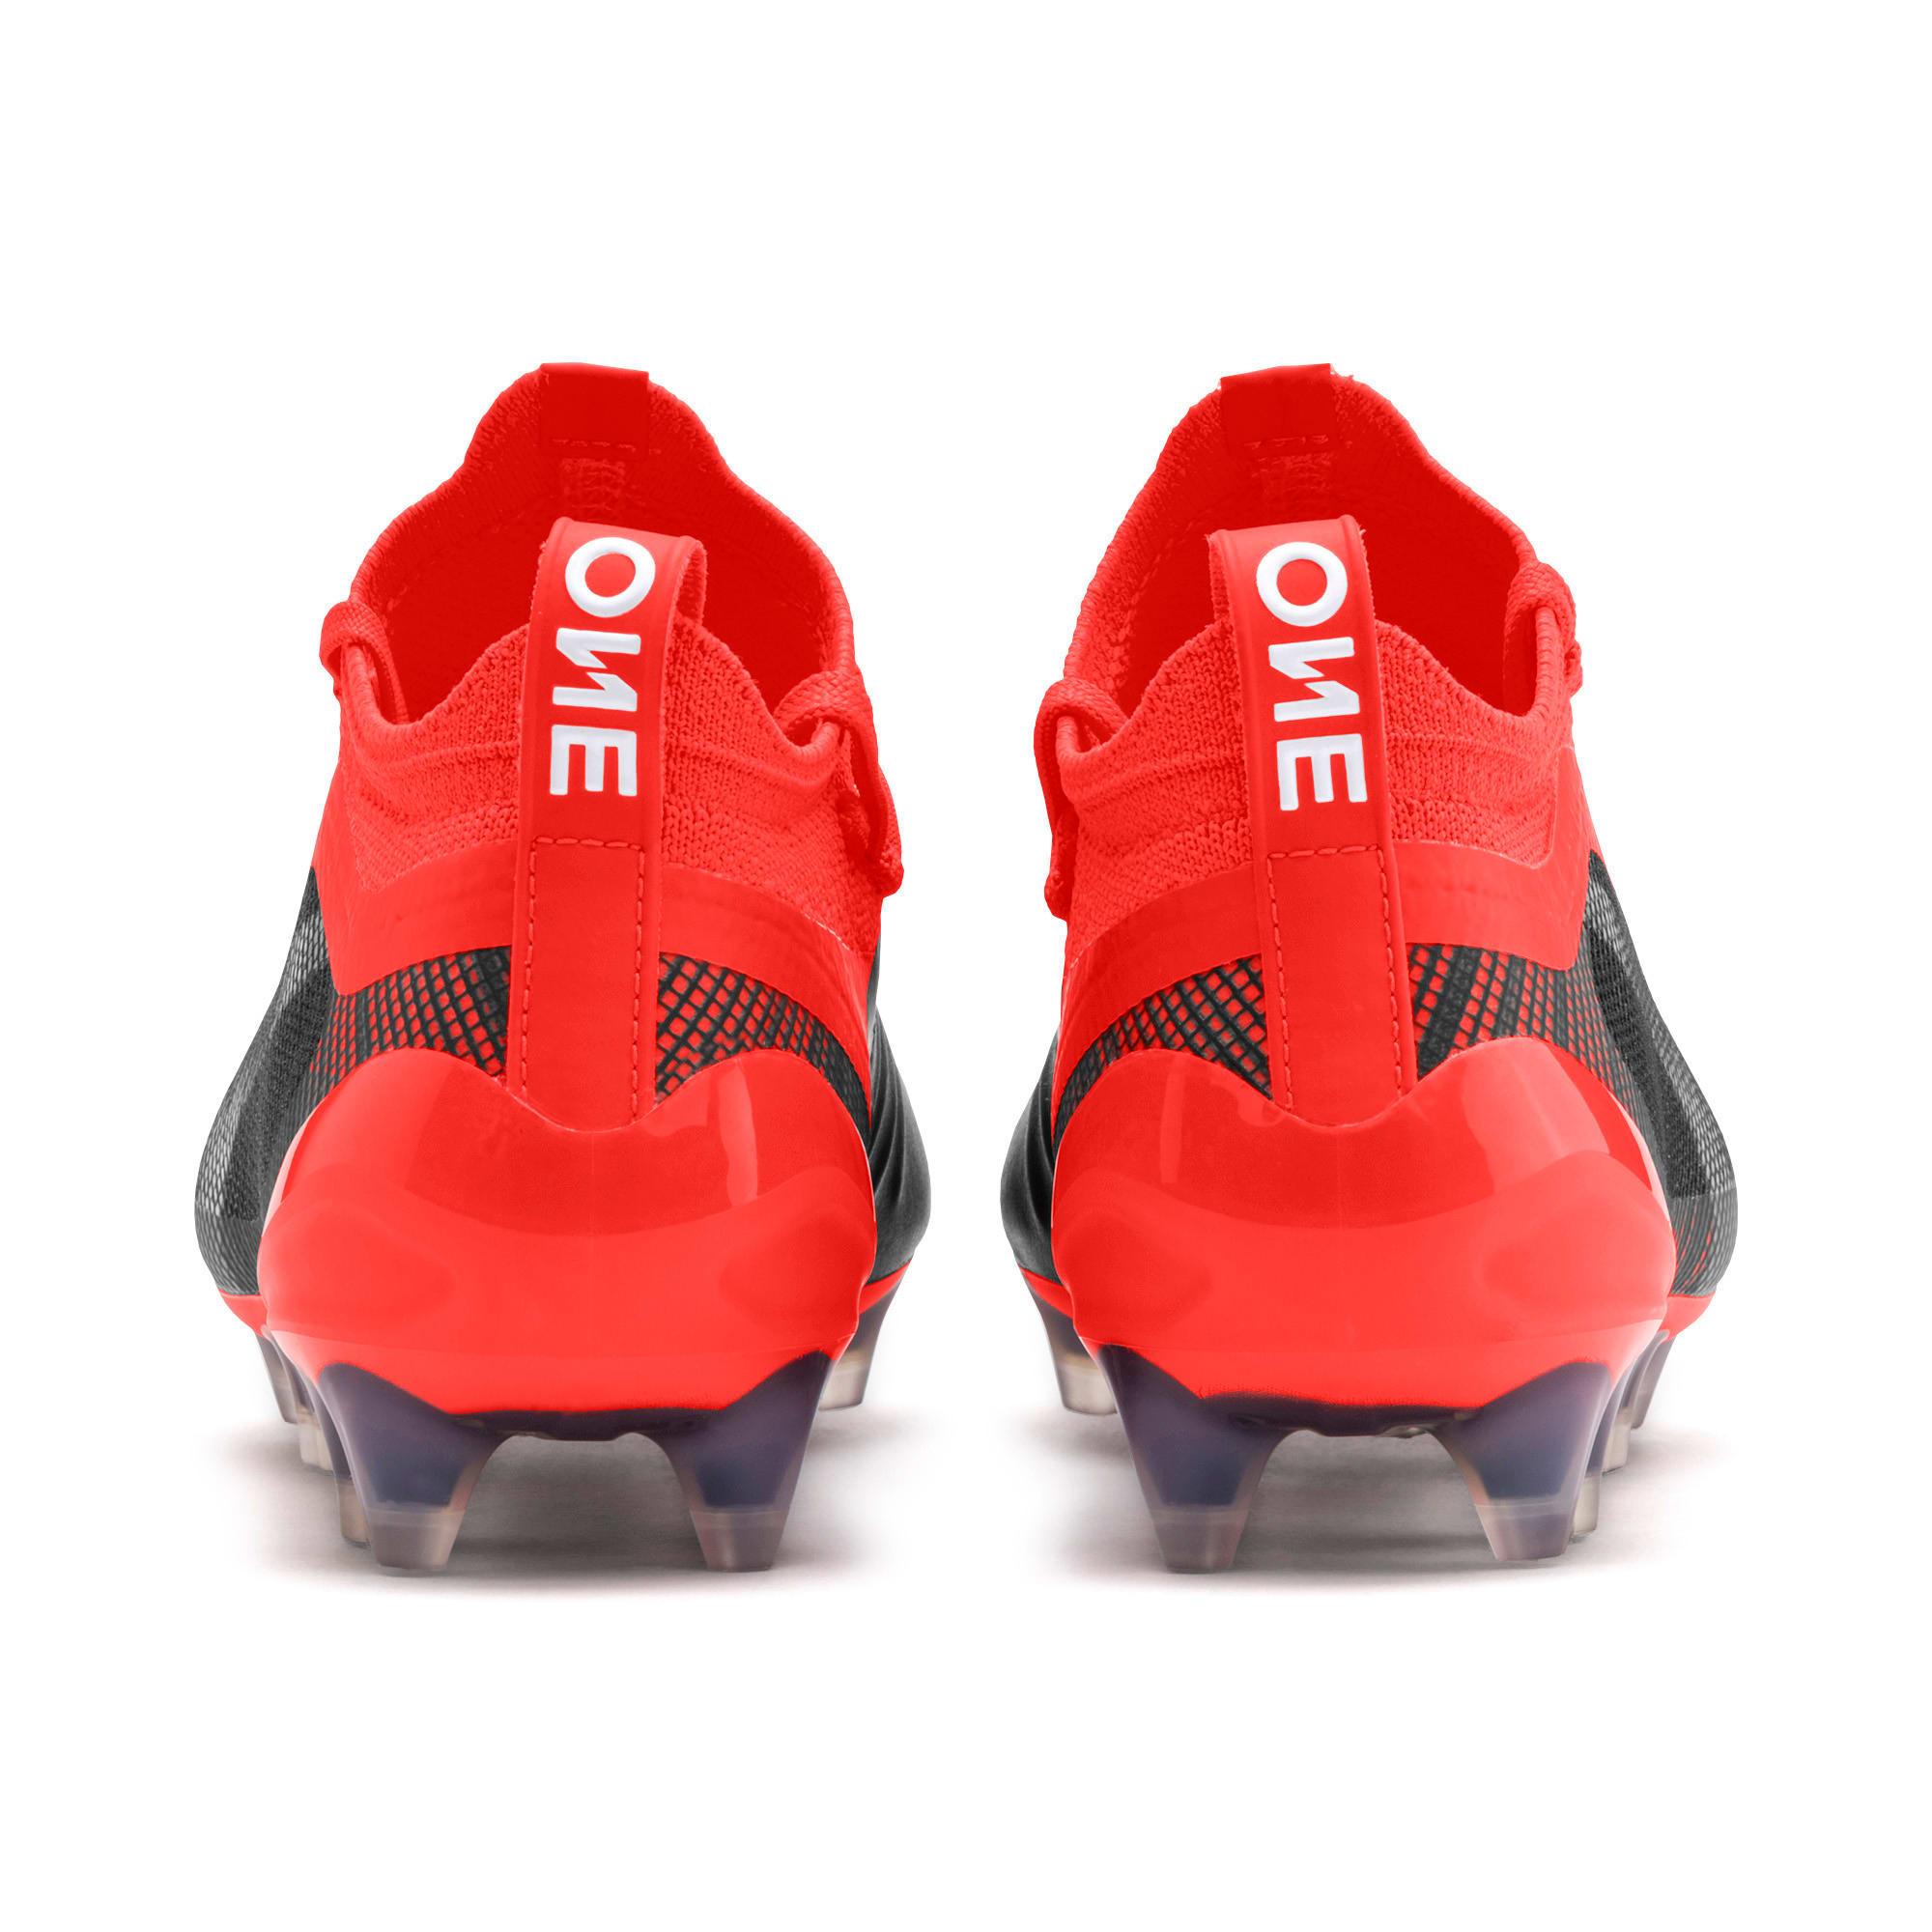 Thumbnail 3 of PUMA ONE 5.1 FG/AG Soccer Cleats JR, Black-Nrgy Red-Aged Silver, medium